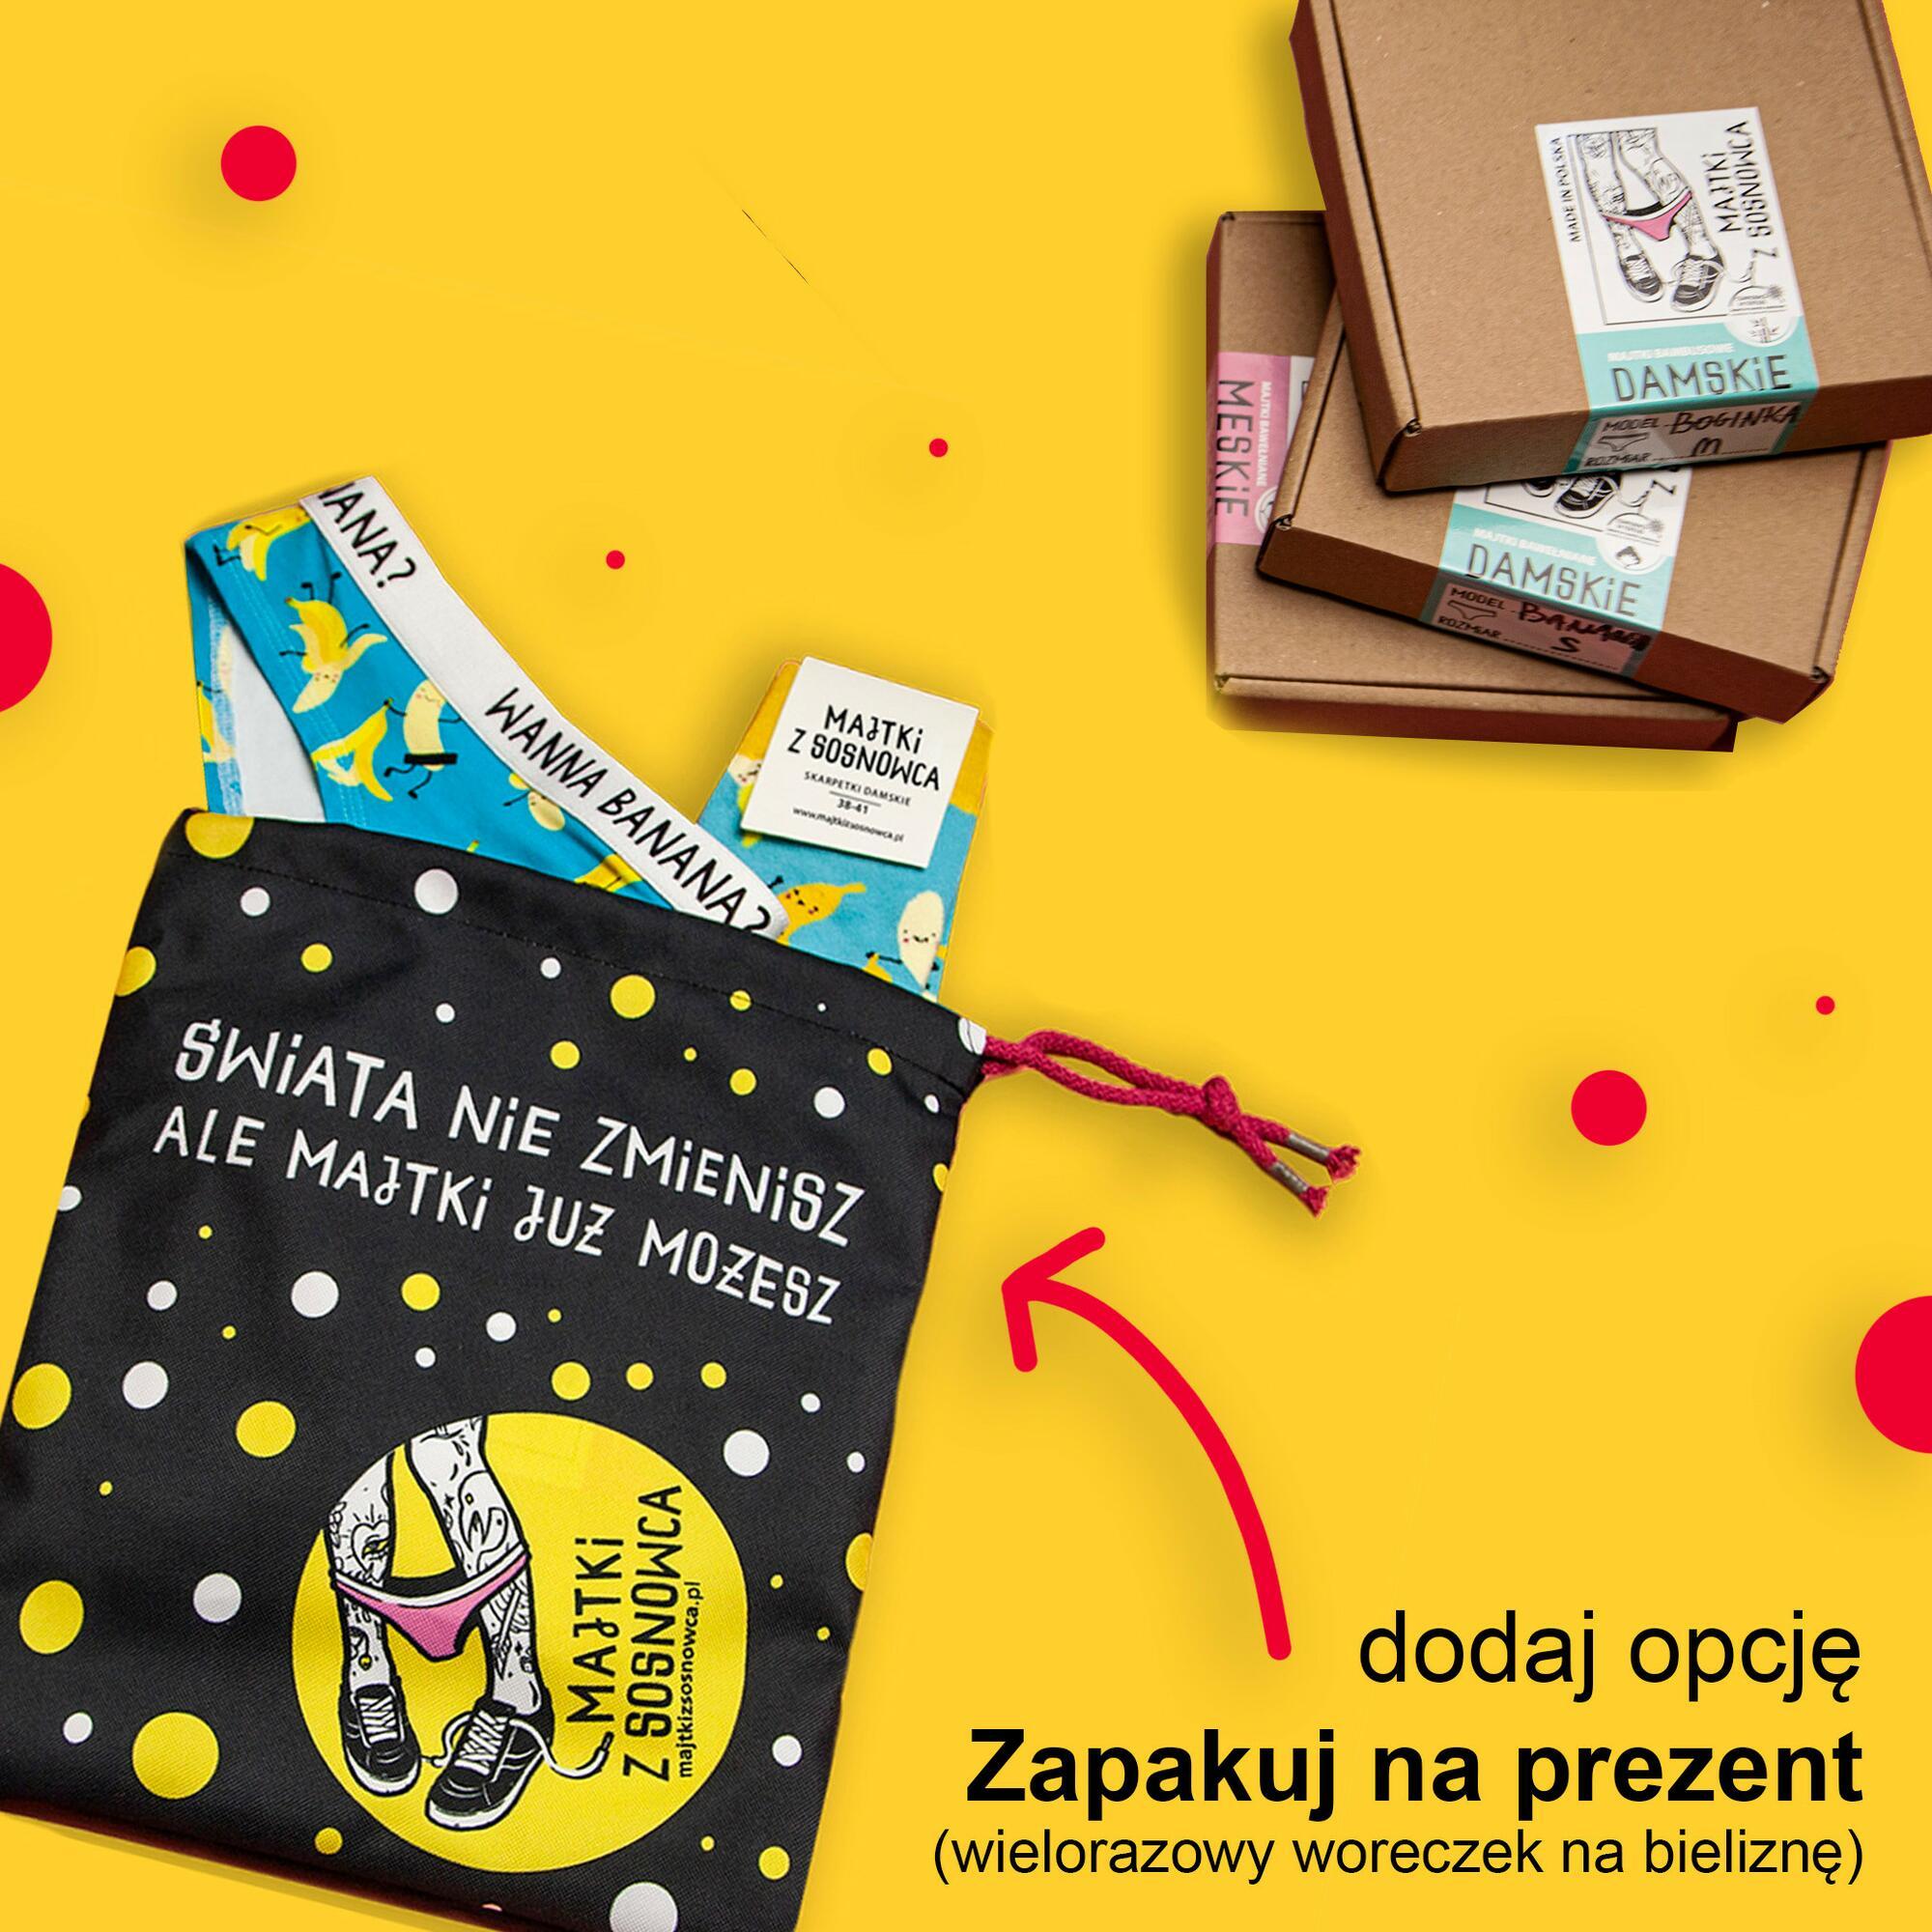 Majtki z Sosnowca - KLASYK - bokserki bambusowe męskie czarne z napisem - Majtki z Sosnowca by After Panty   JestemSlow.pl